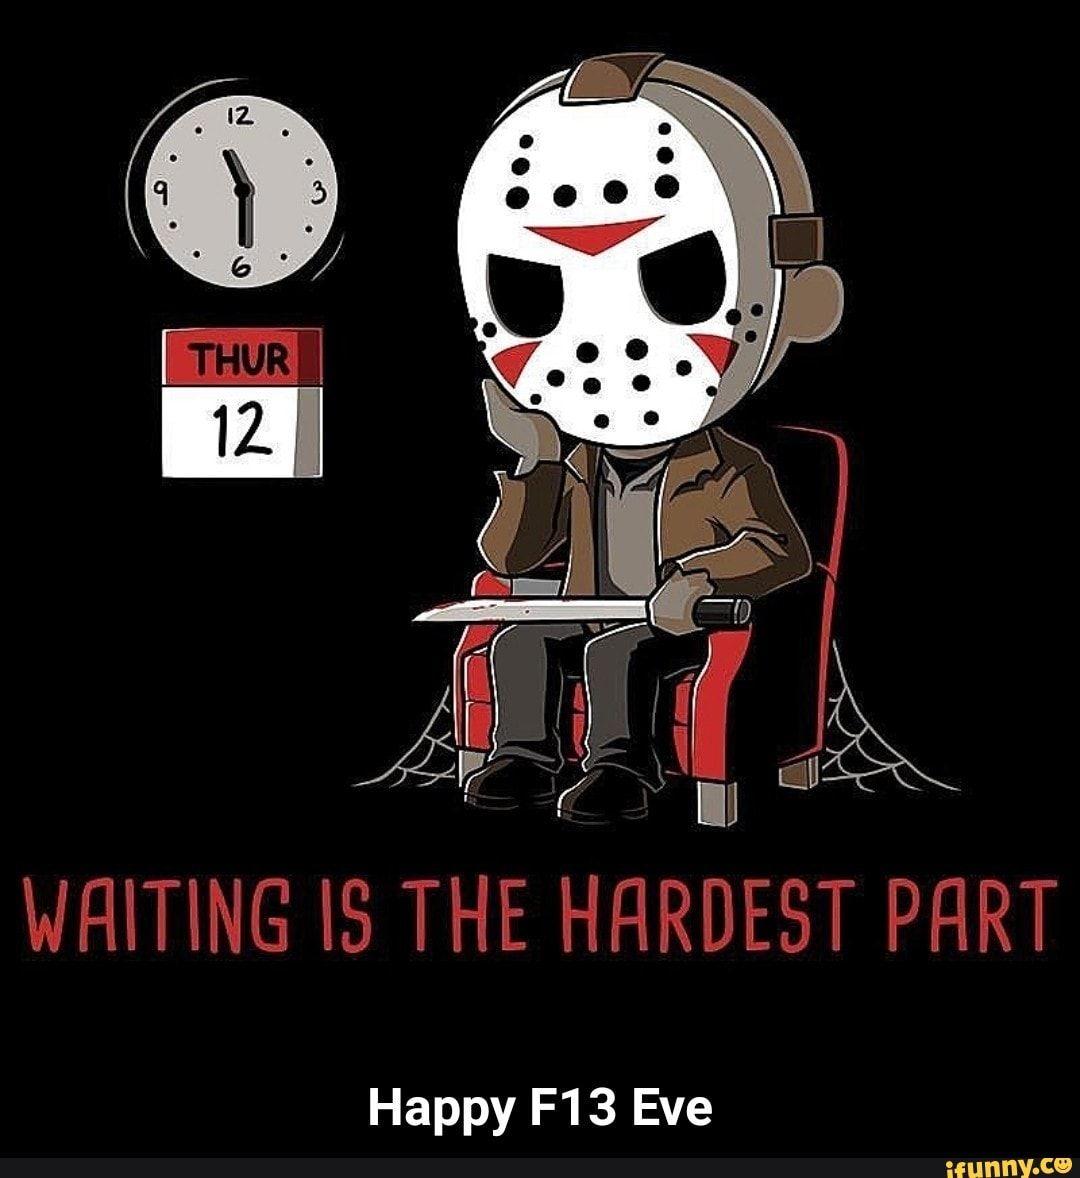 Happy F13 Eve Happy F13 Eve iFunny ) Horror movies